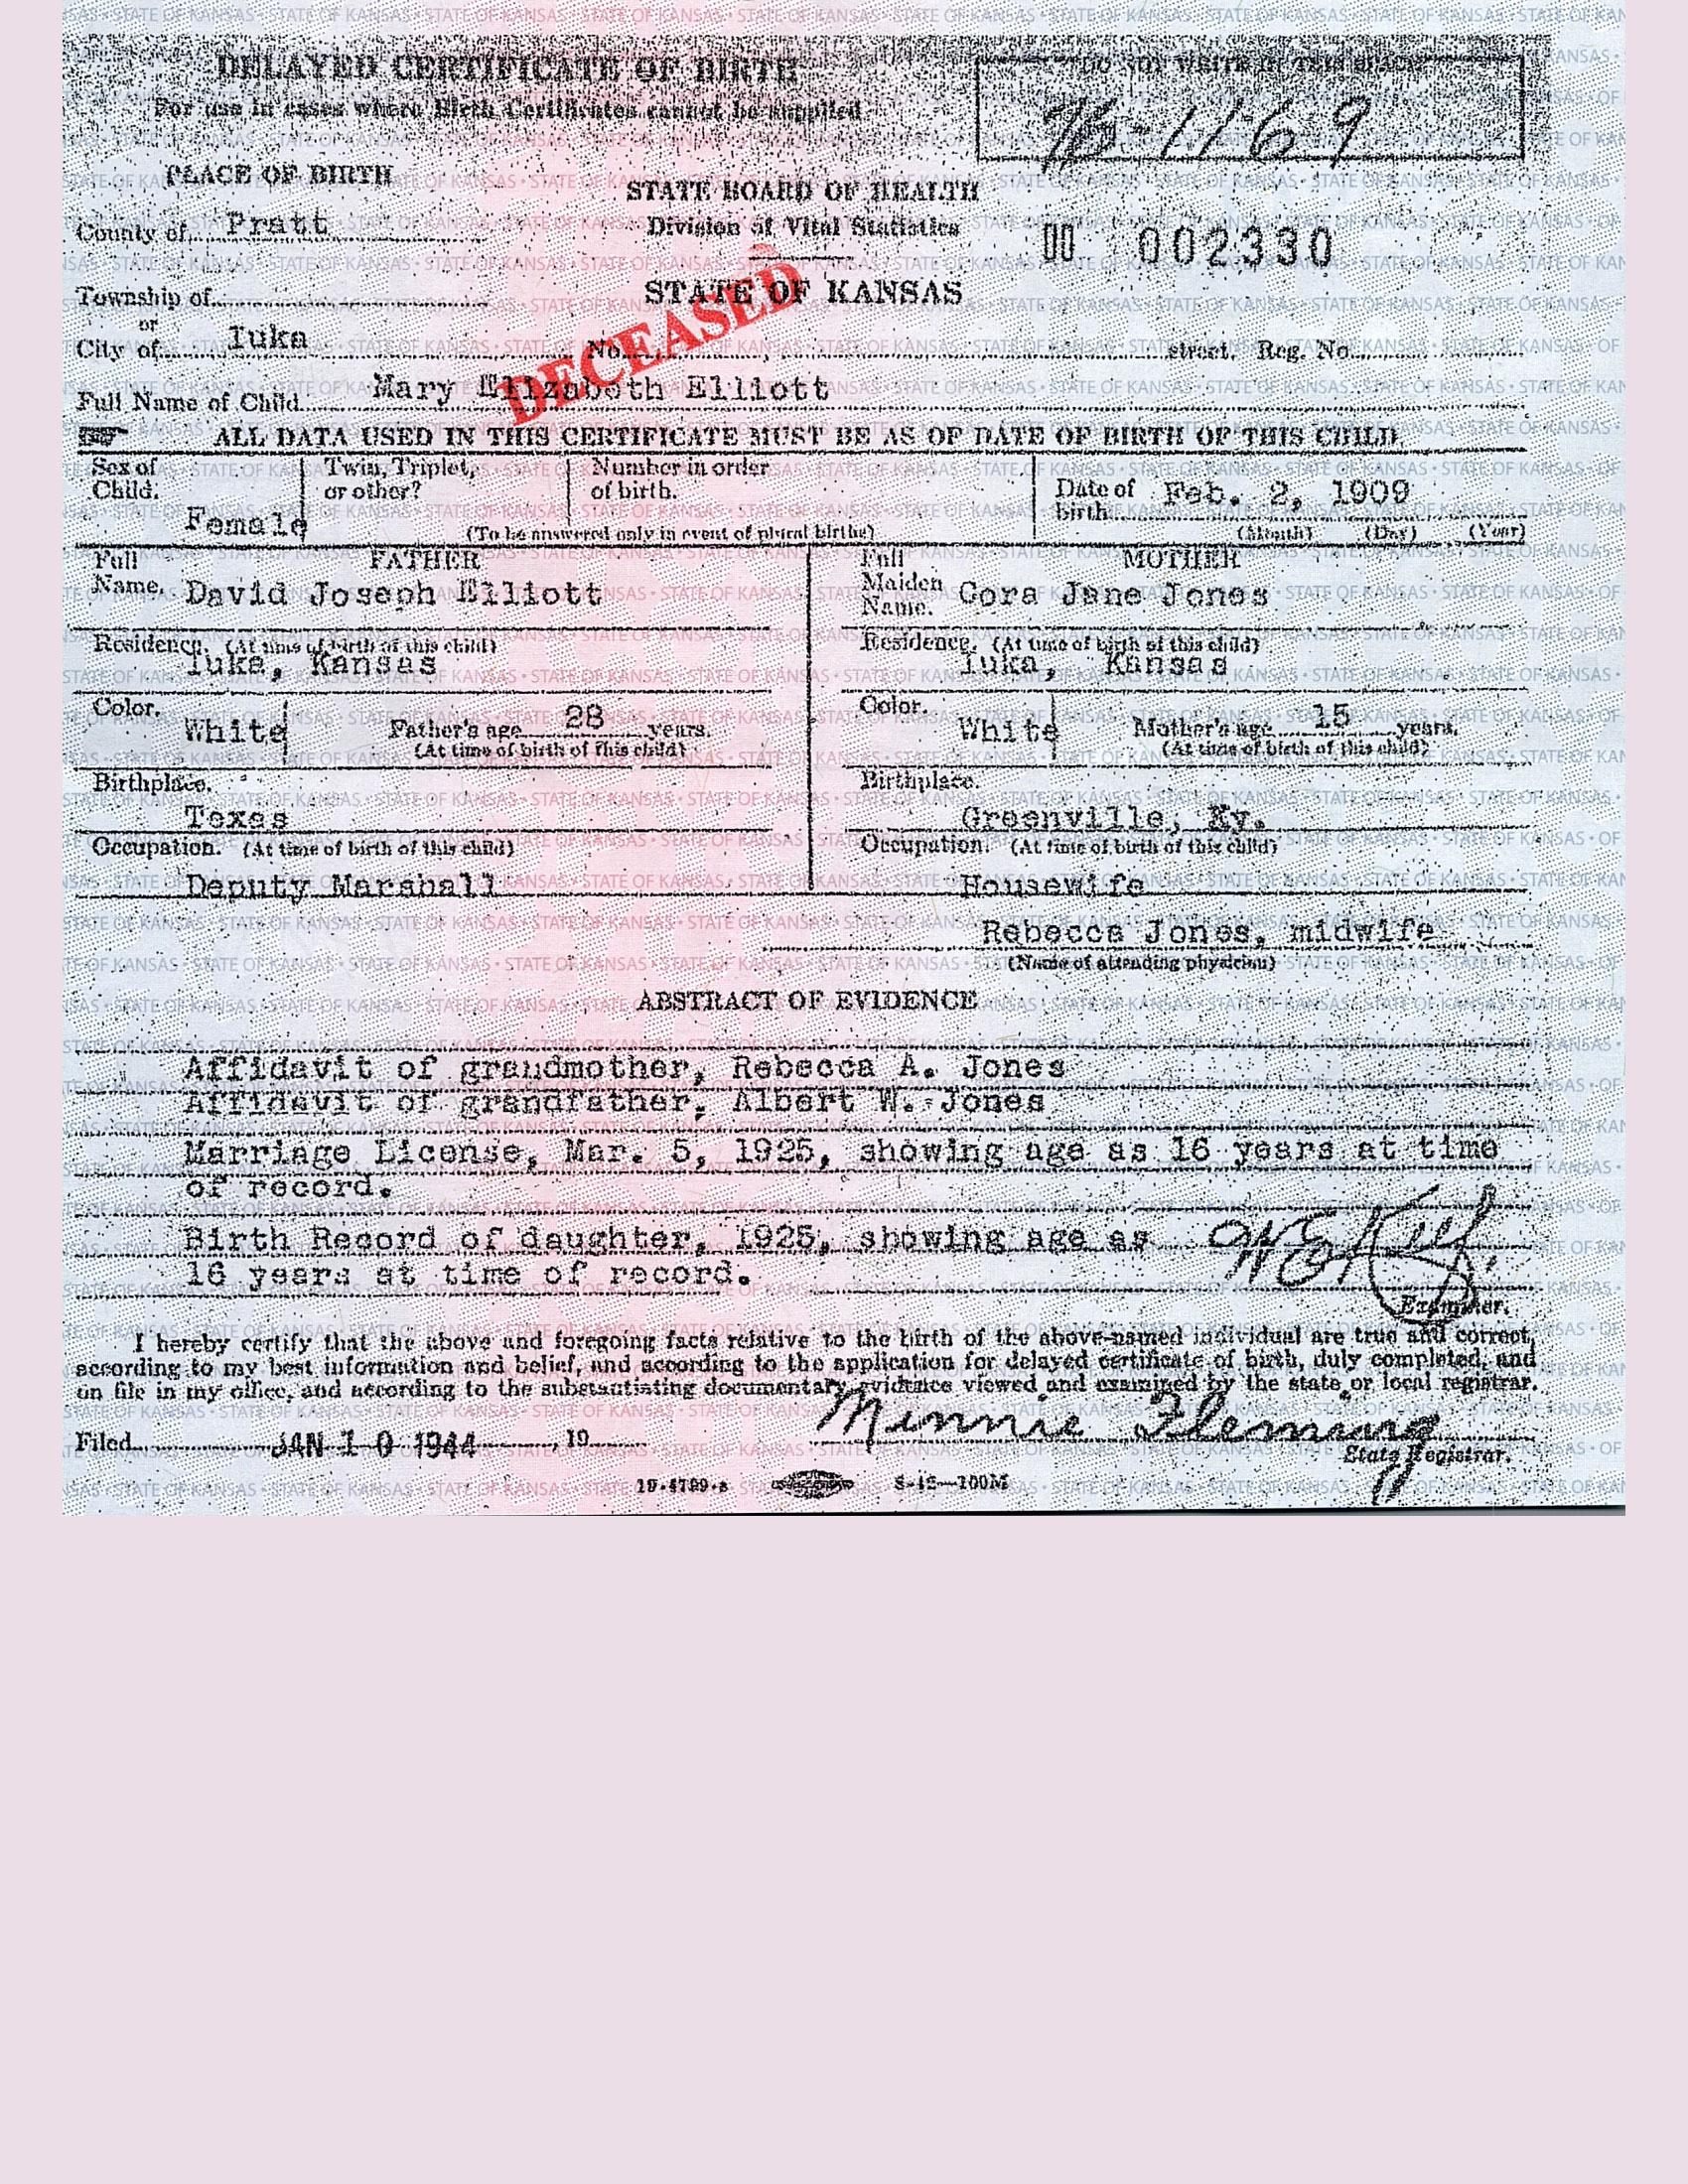 reason for delayed birth records